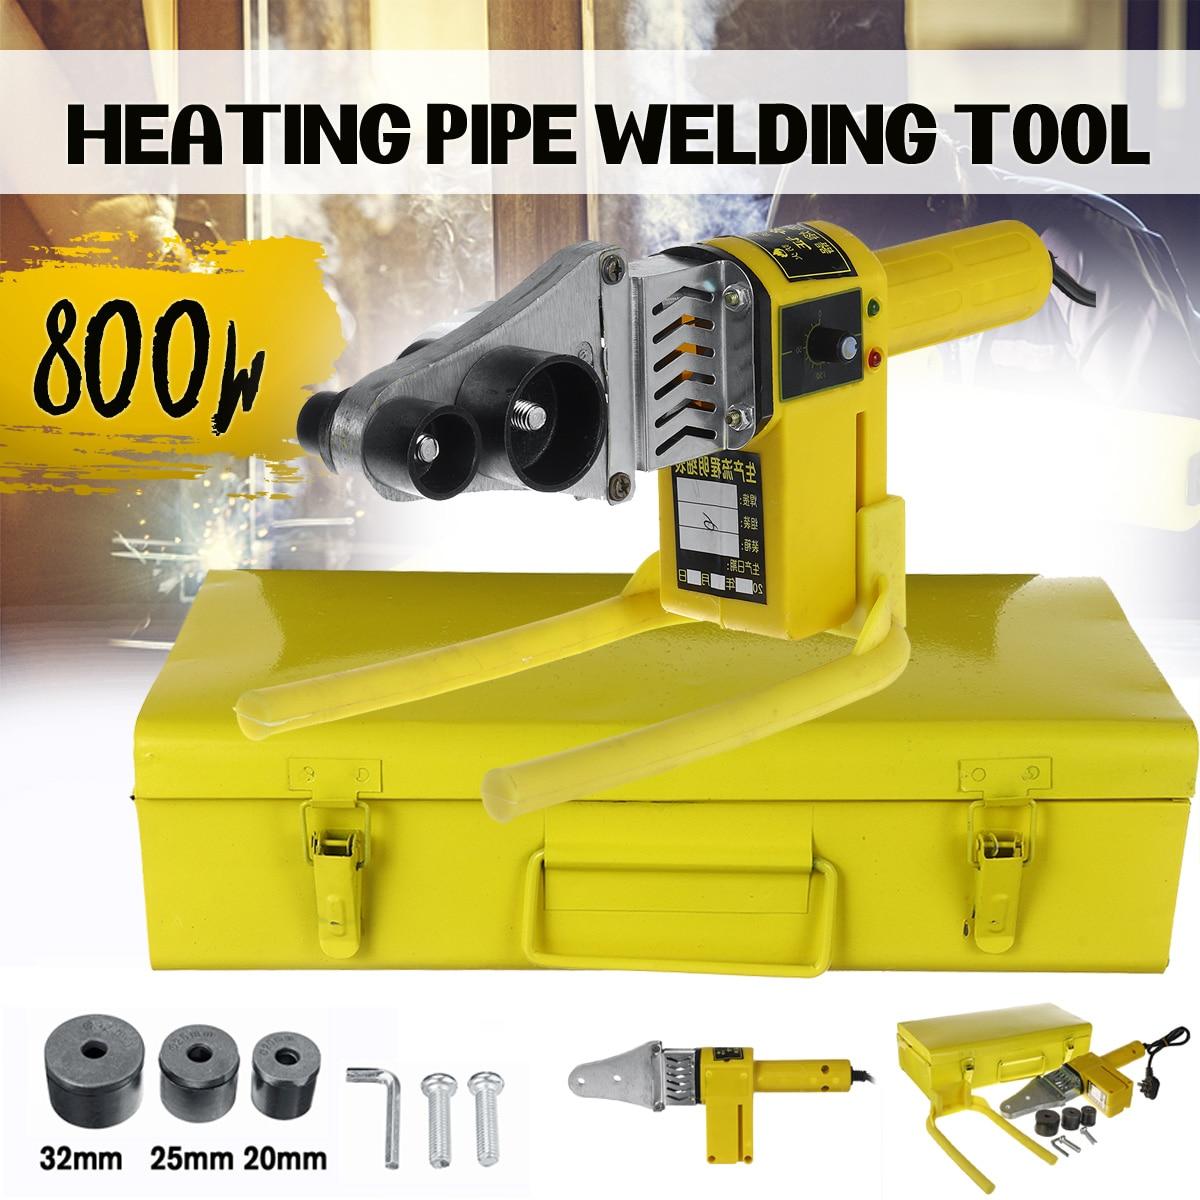 800W Electric Pipe Welding Machine Heating Tool Heads Set For PPR PB PE Plastic Tube PPR Welder Hot Melt Machine Temper Control